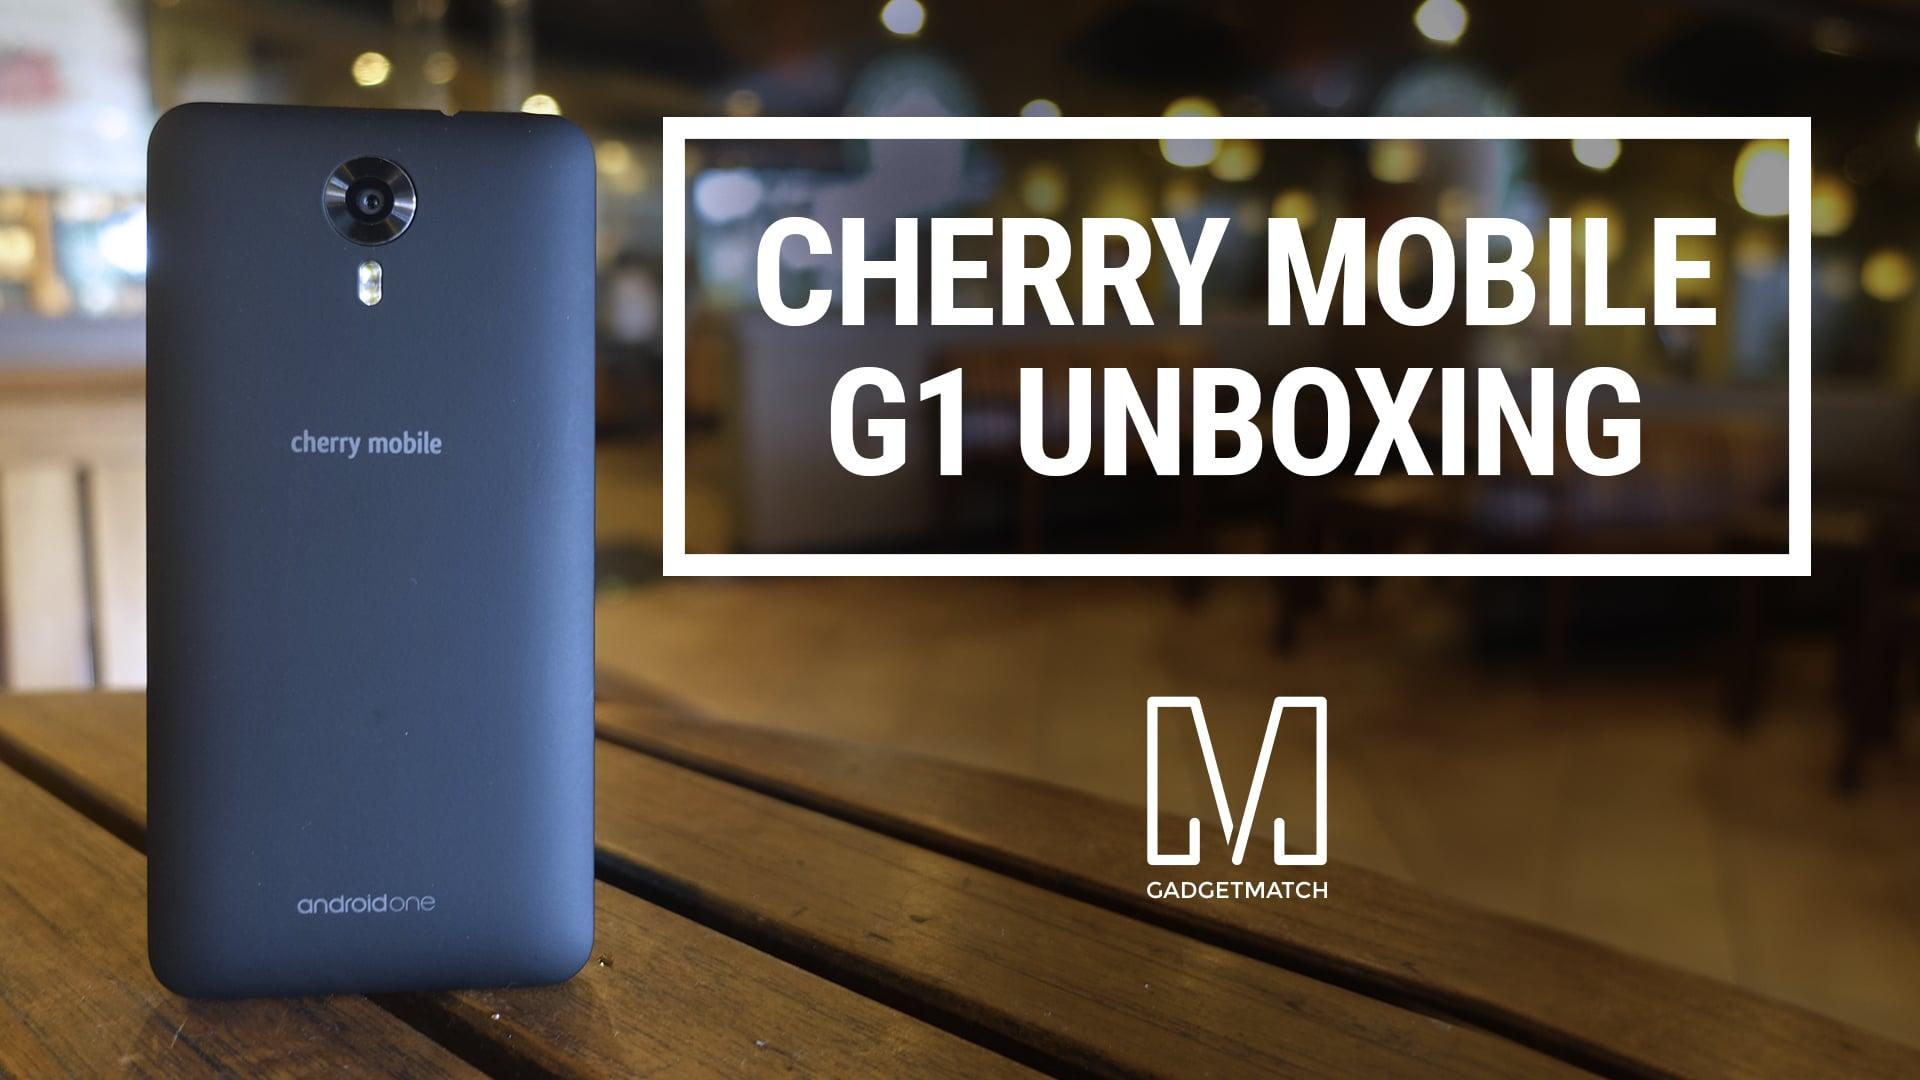 Cherry Mobile G1